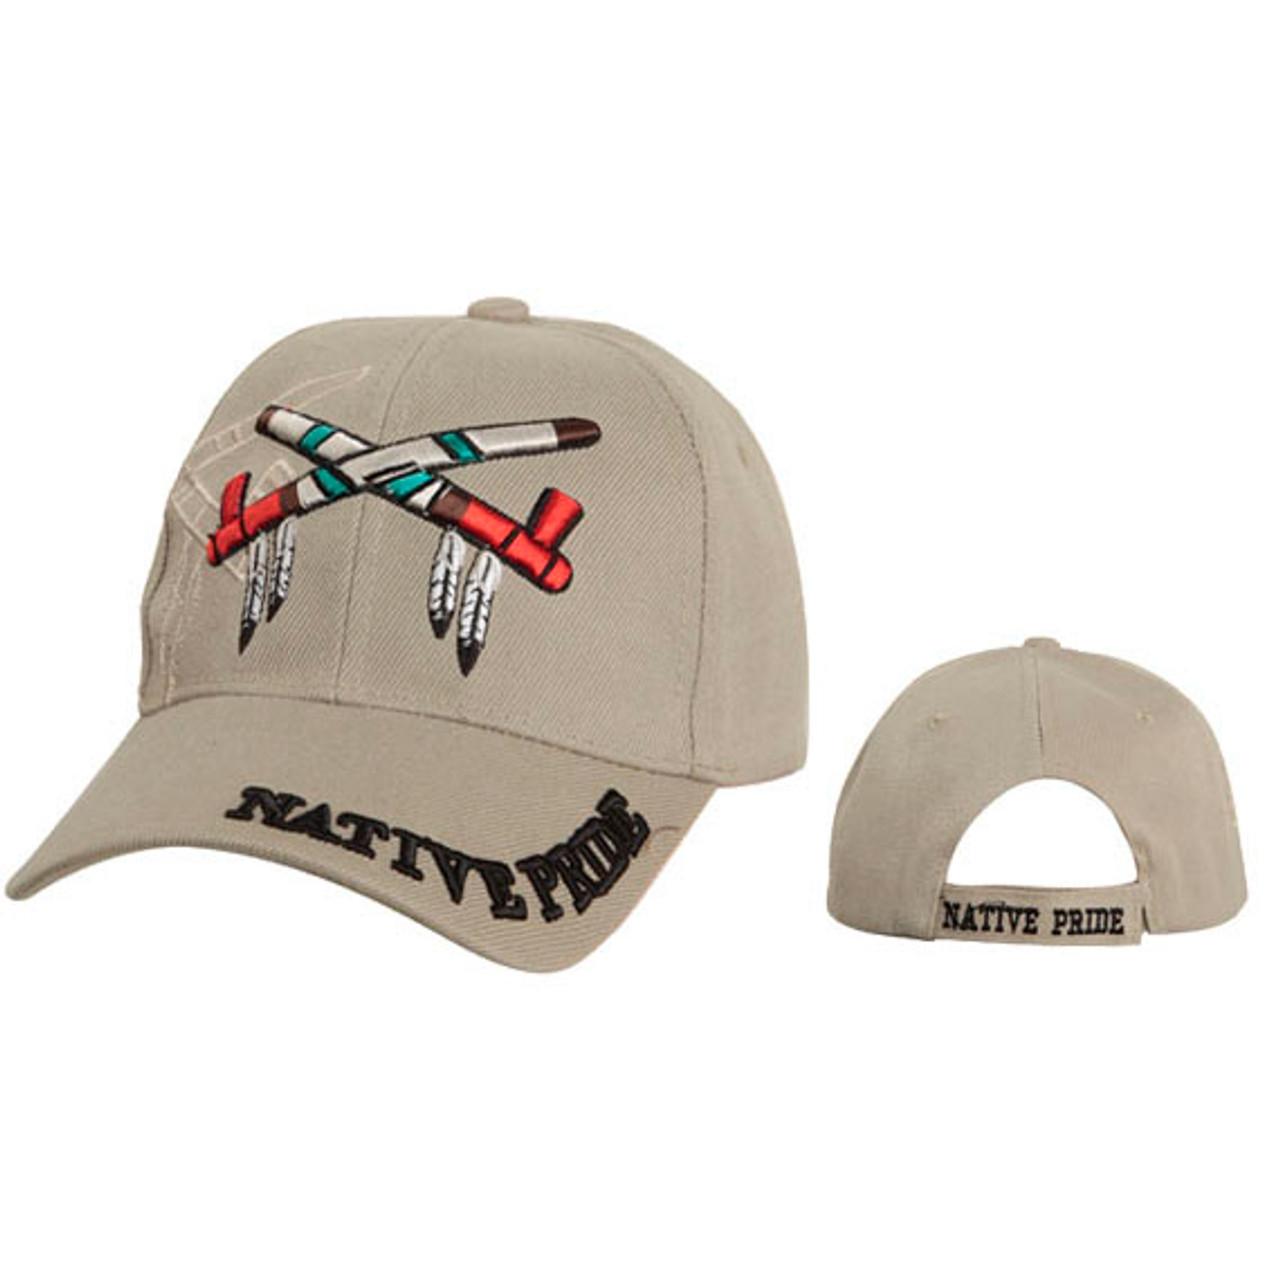 Native Pride Wholesale Cap ~ Khaki